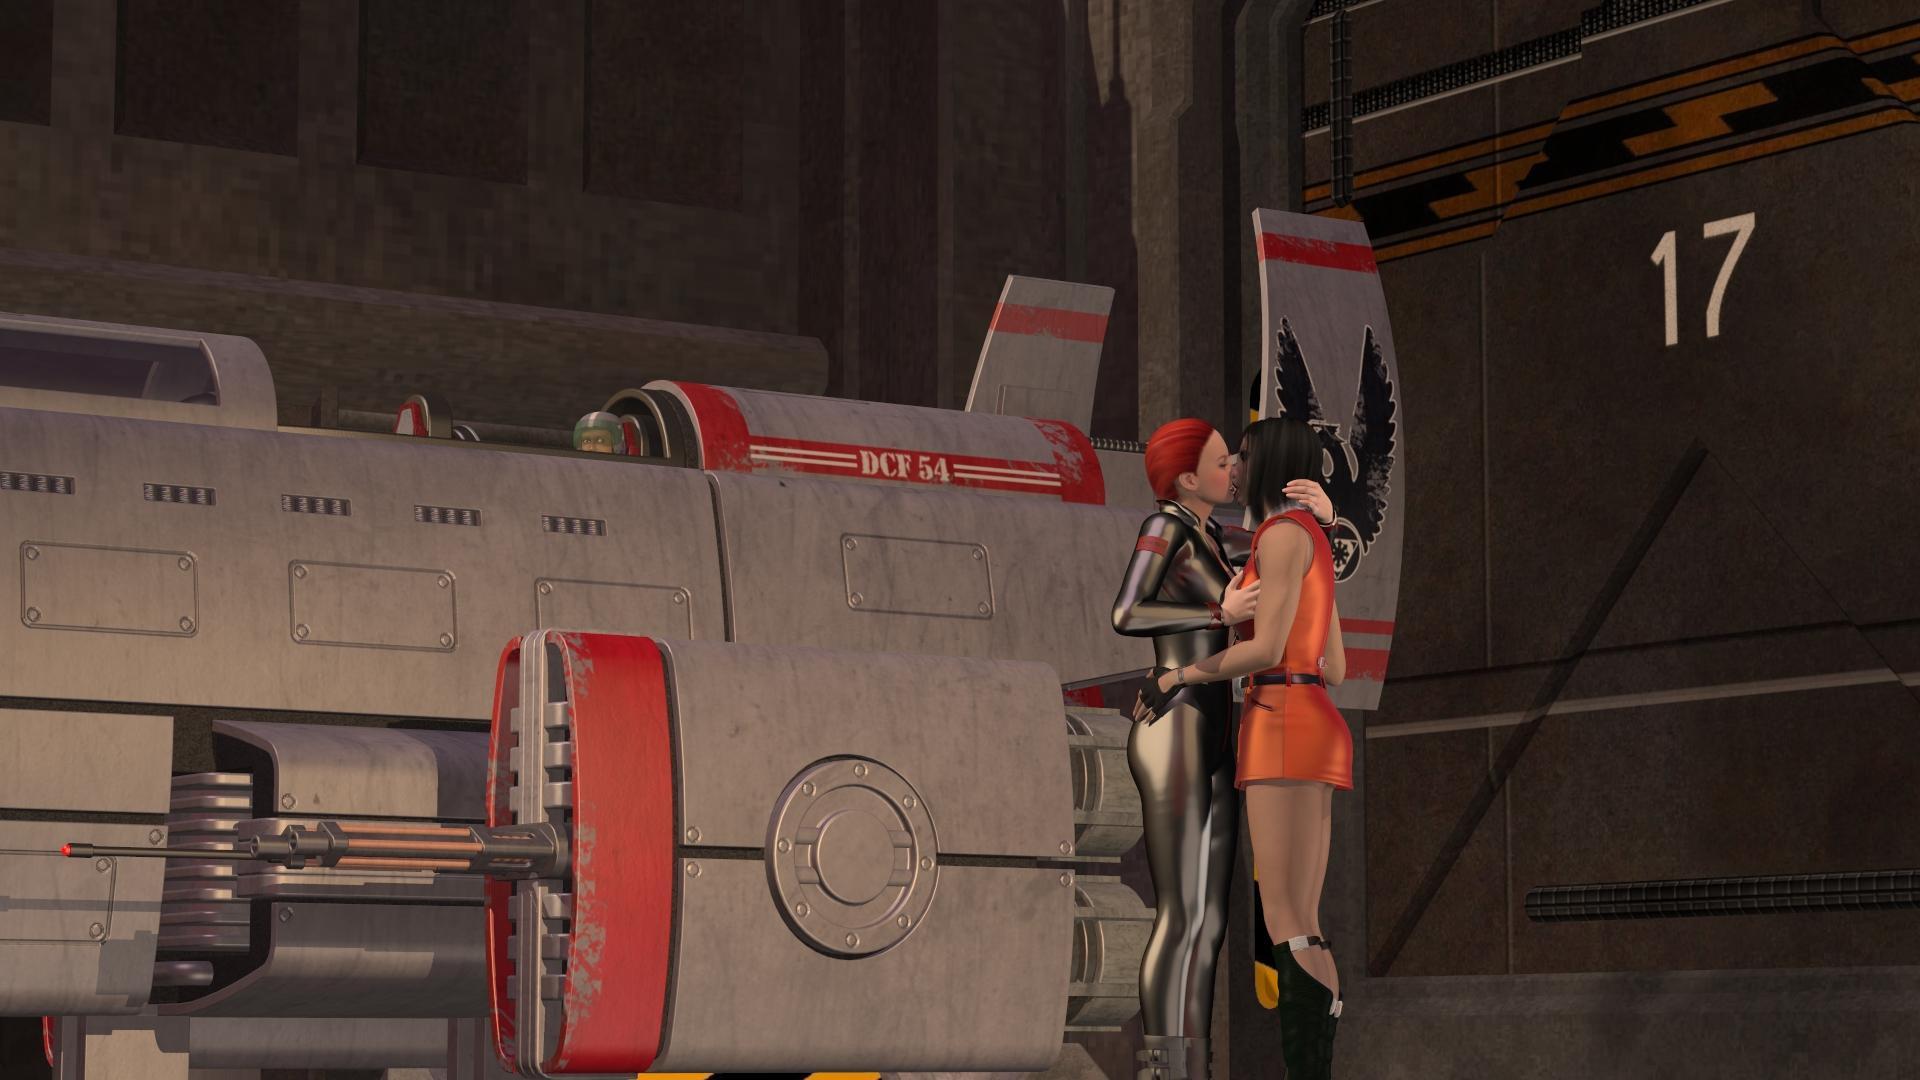 Deployment by DrMcQuark